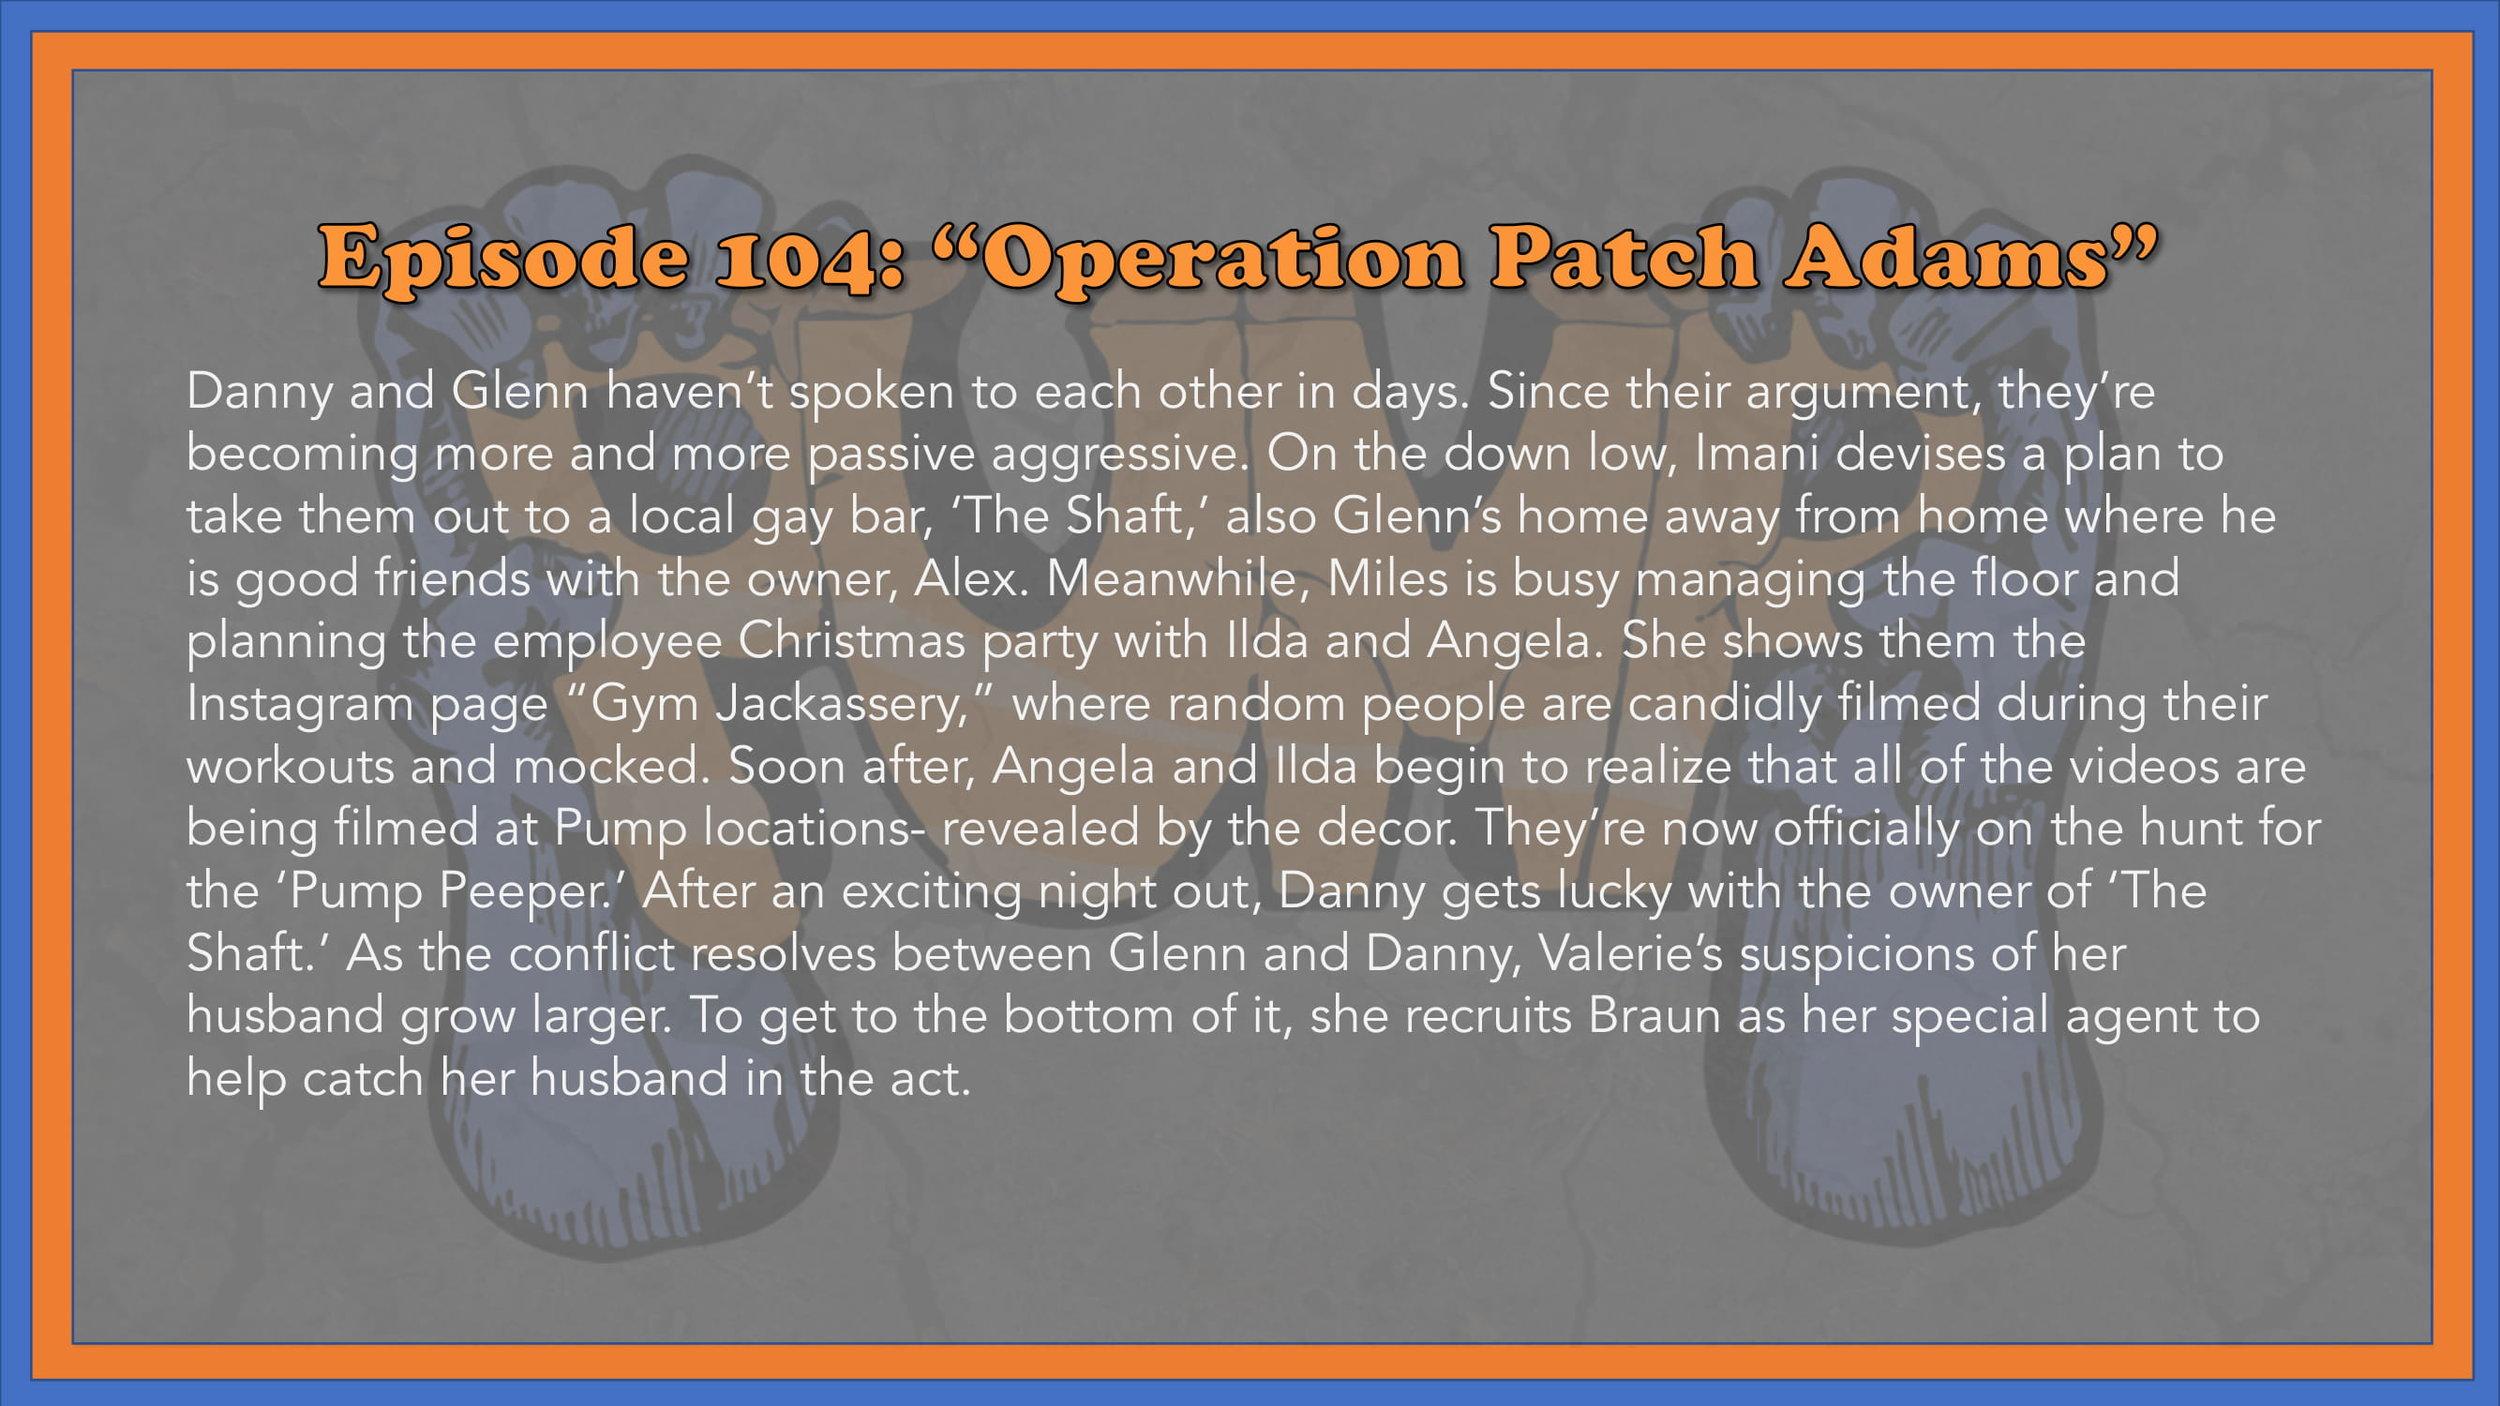 Pump Episode Outlines Season One 120618-5.jpg